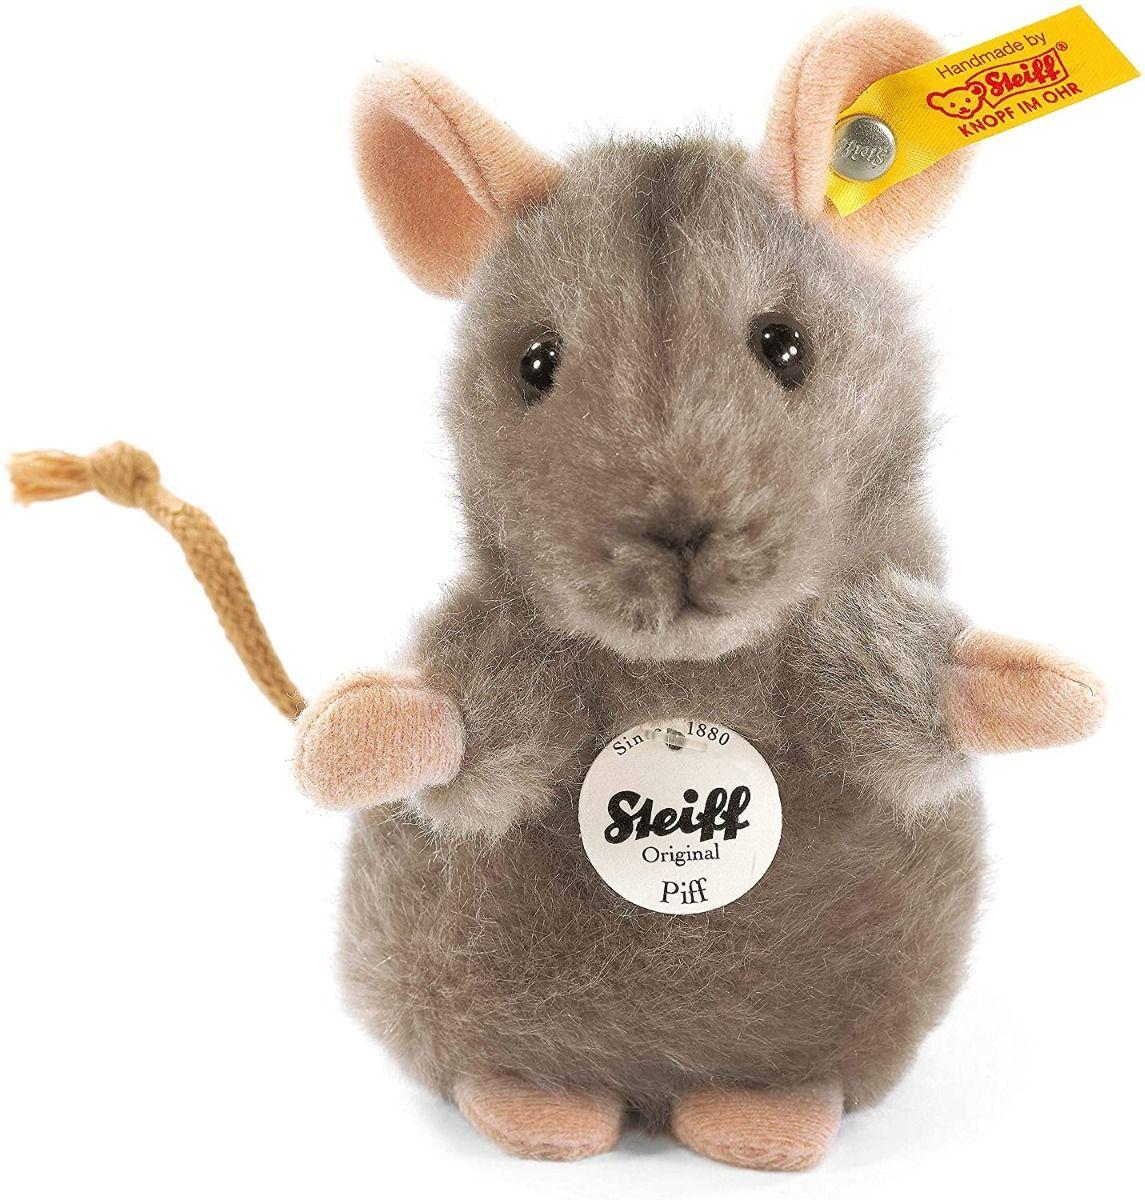 Steiff Piff Mouse Grey Plush 10cm 056222